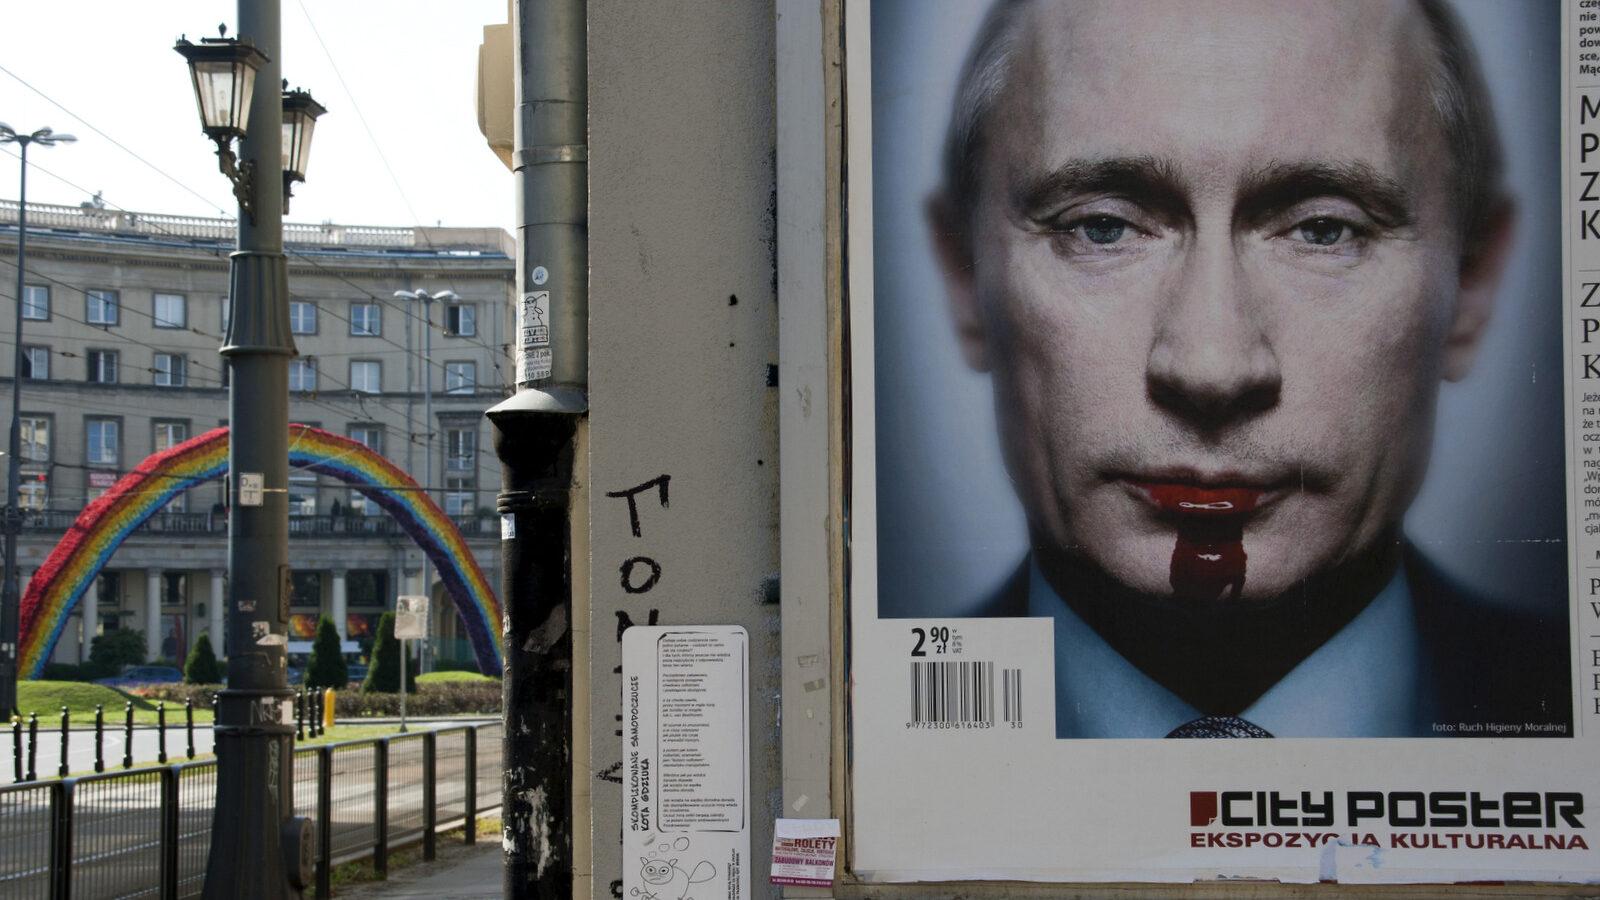 Street art in Warsaw, Poland depicting Russian President Vladimir Putin. (Photo: Alberto Cabello/Flickr CC)